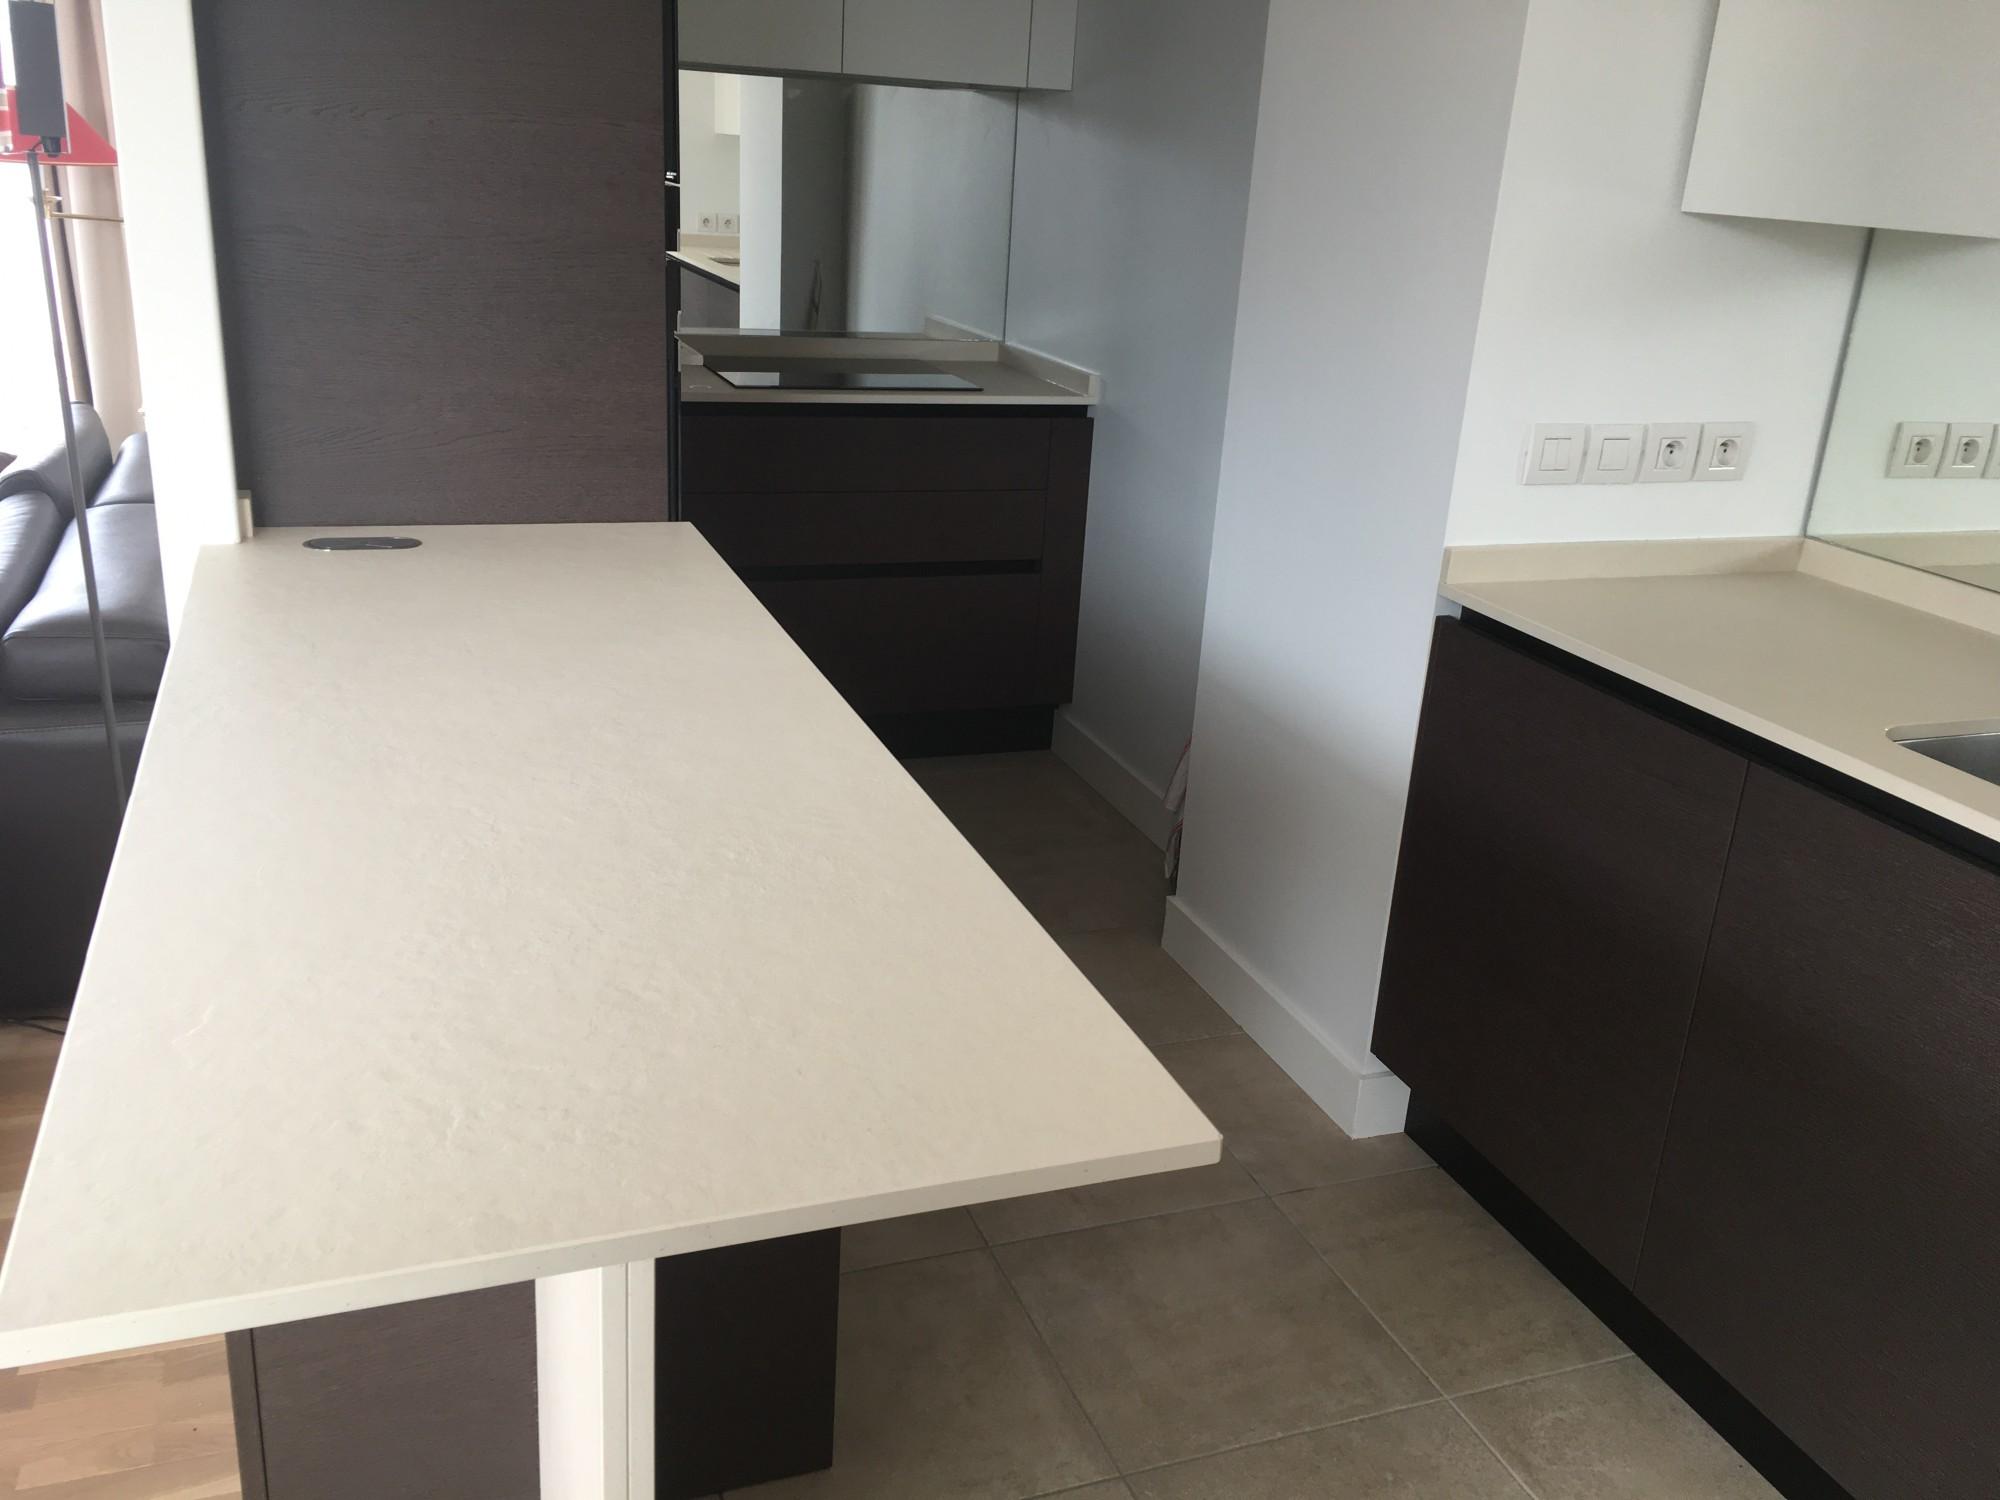 plan de travail dekton avis cool cuisine bois massif plan de travail en dekton coloris sirius. Black Bedroom Furniture Sets. Home Design Ideas